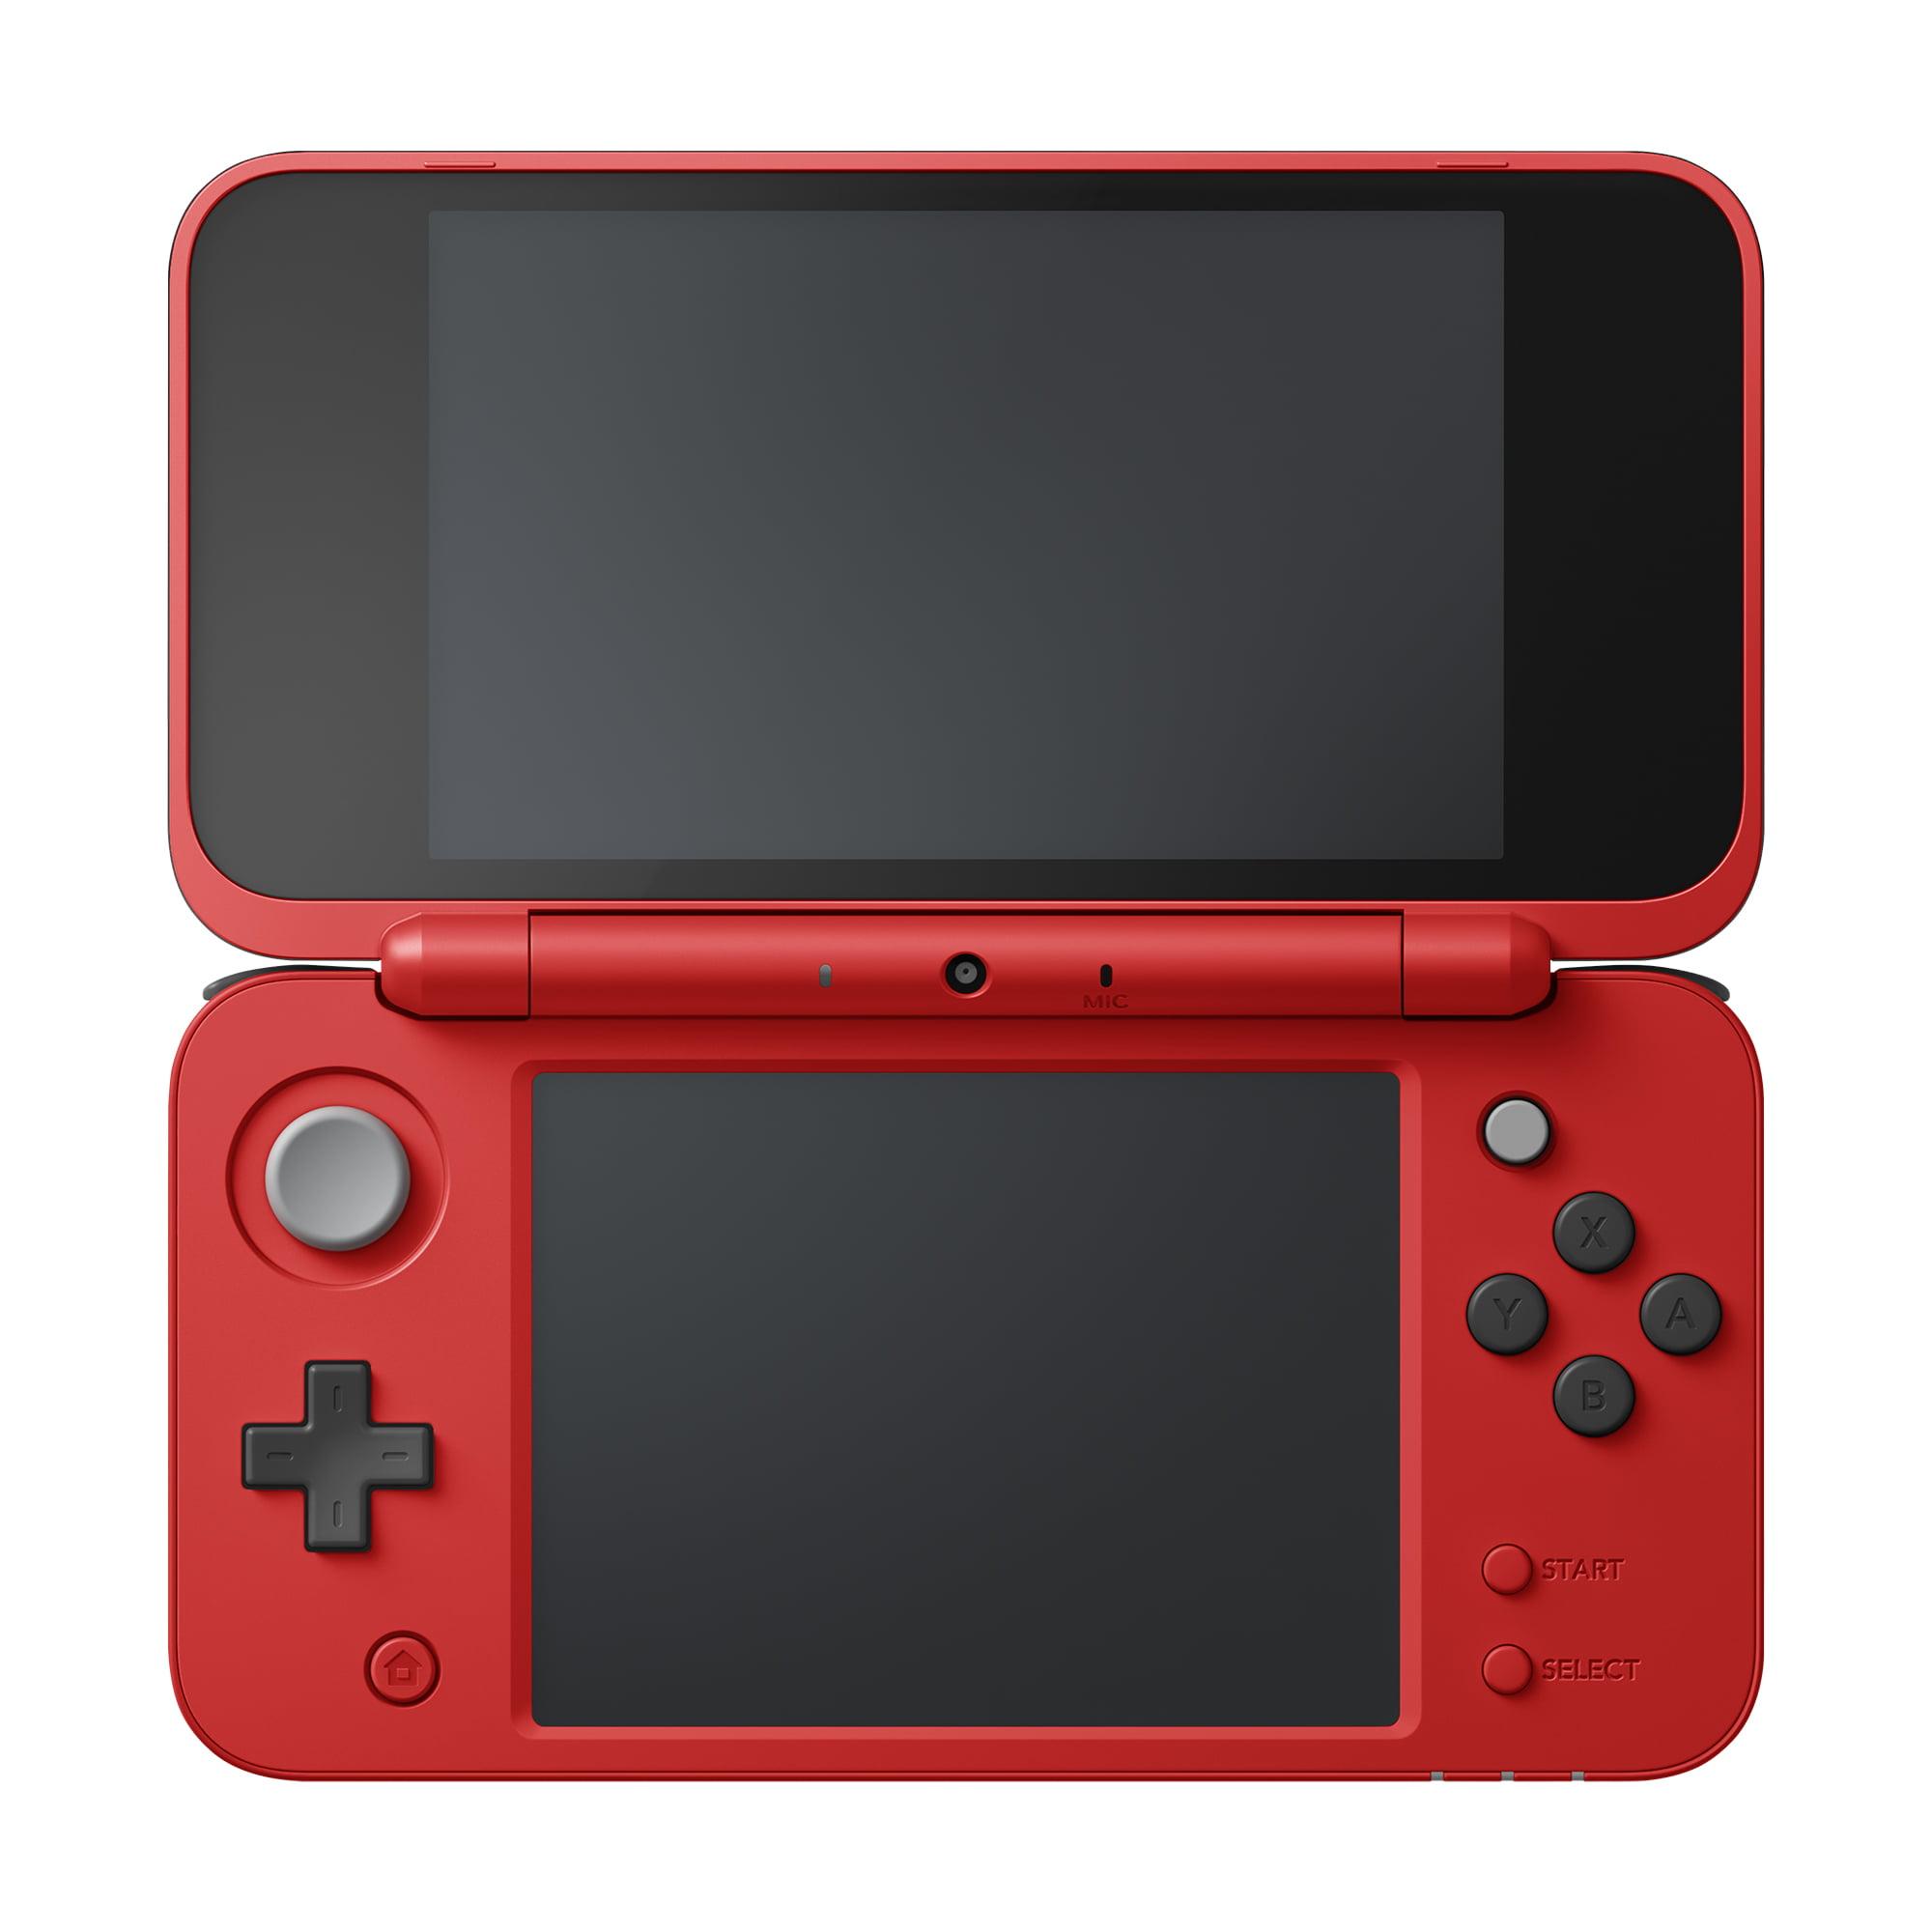 New Nintendo 2DS XL - Pokemon Poke Ball Edition